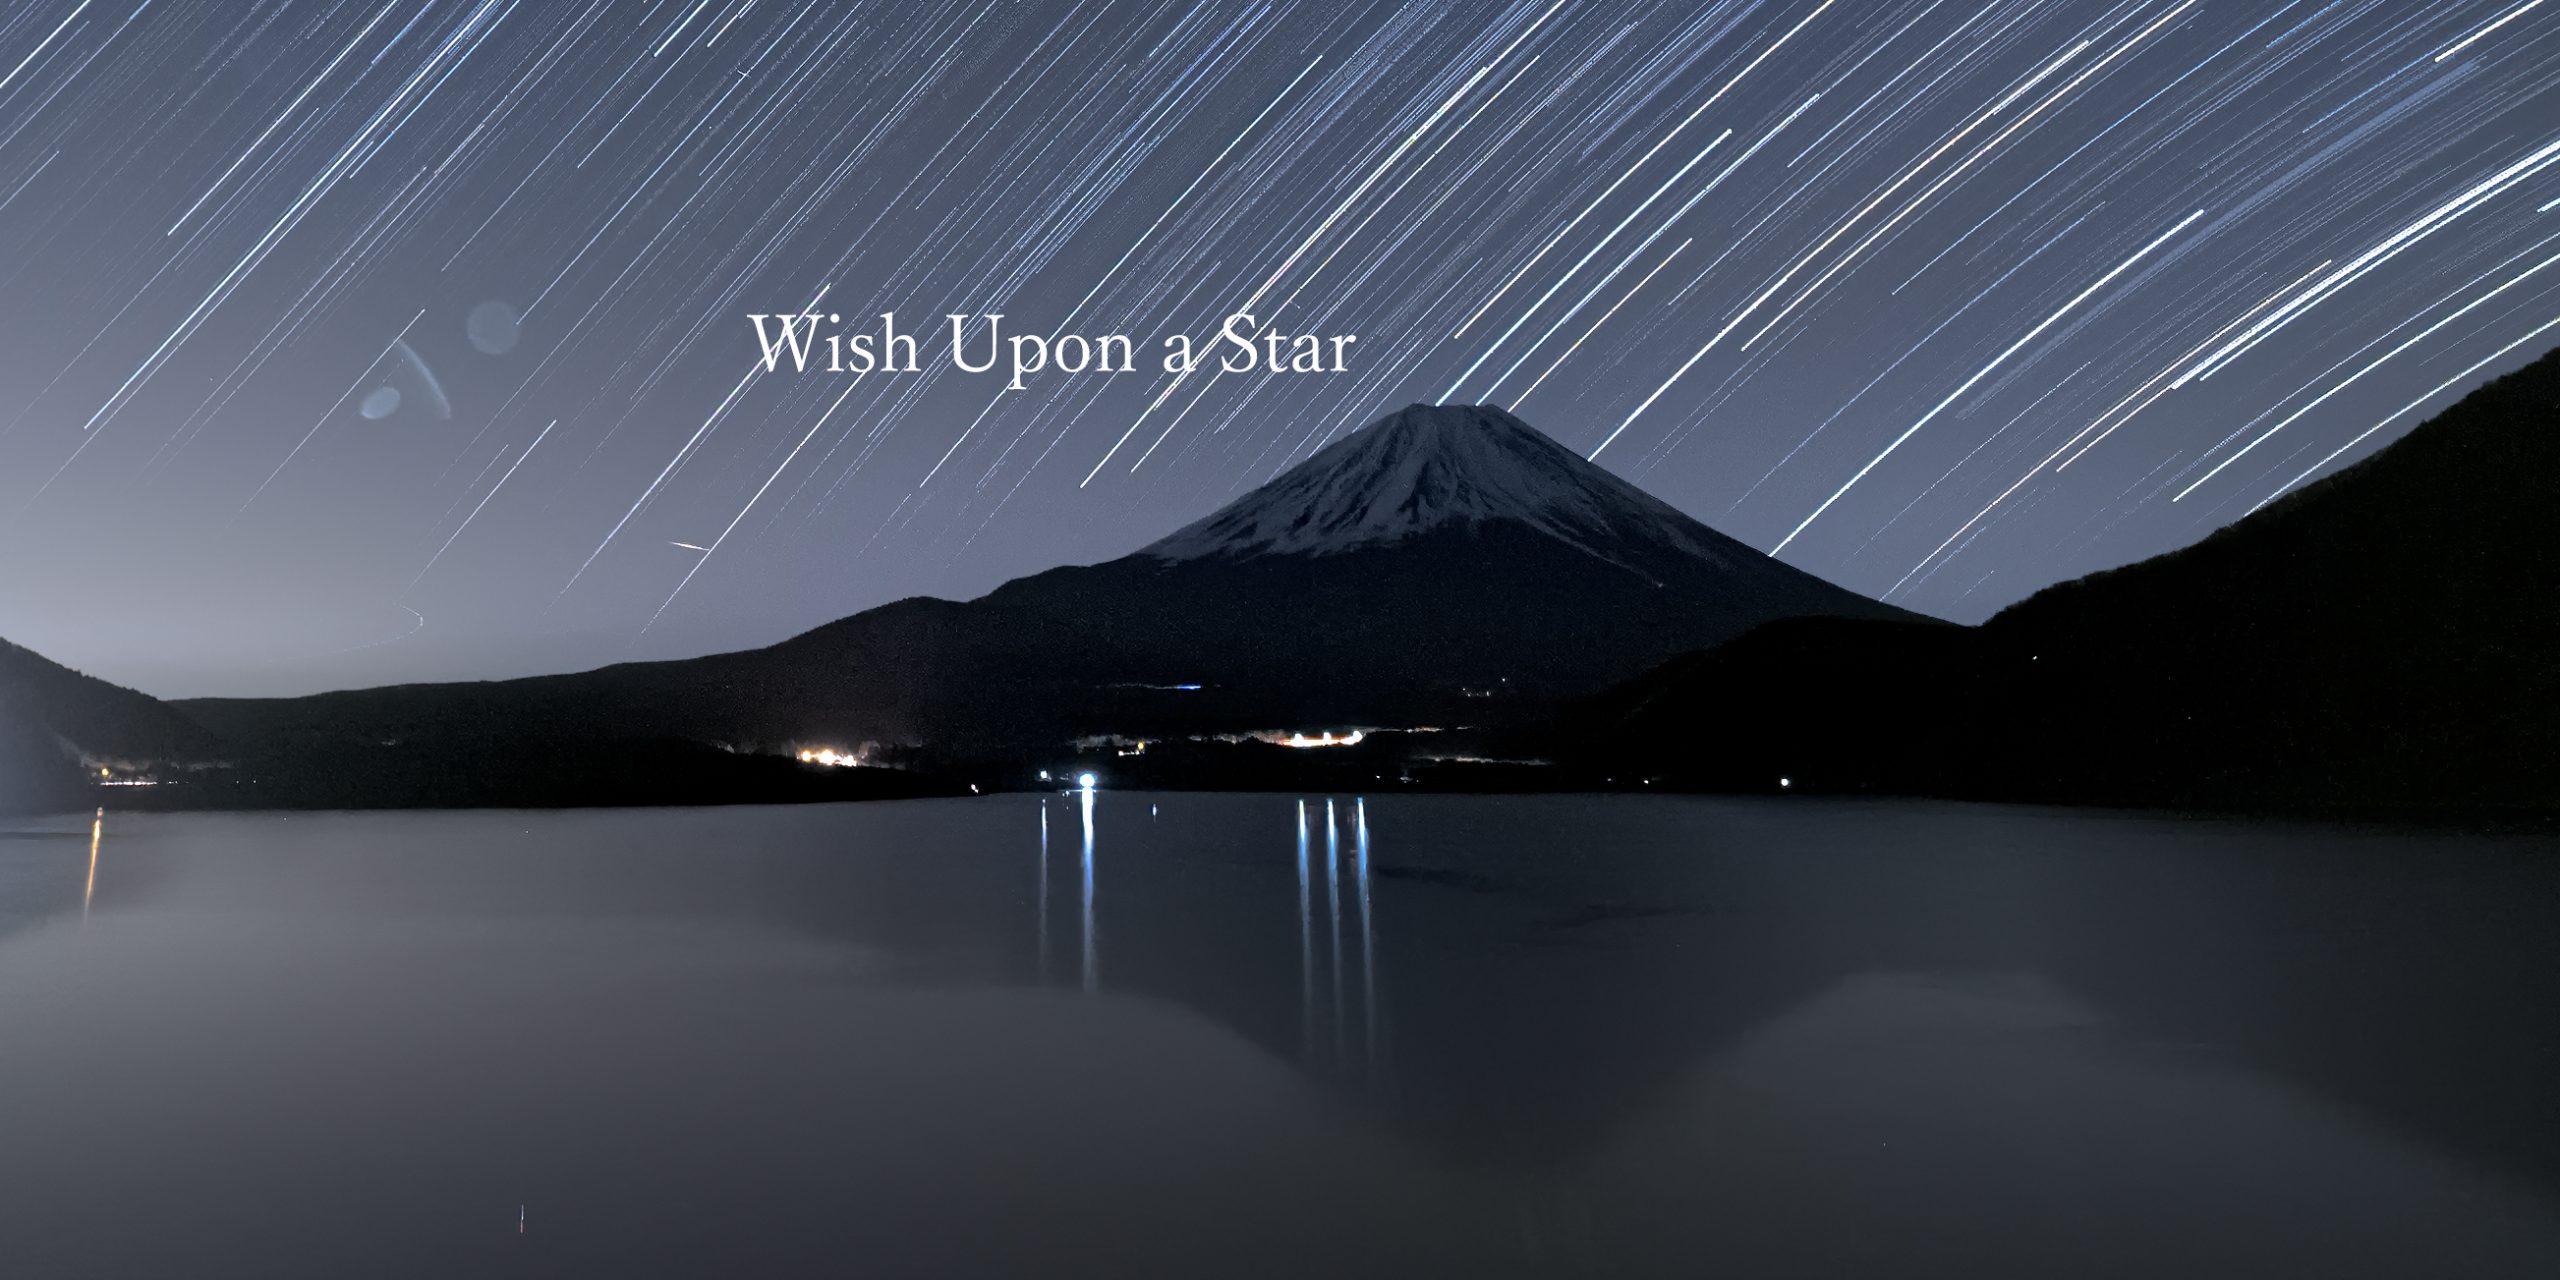 【Wish Upon a Star】Vol.1 小型・軽量・大口径・超広角ズームレンズ